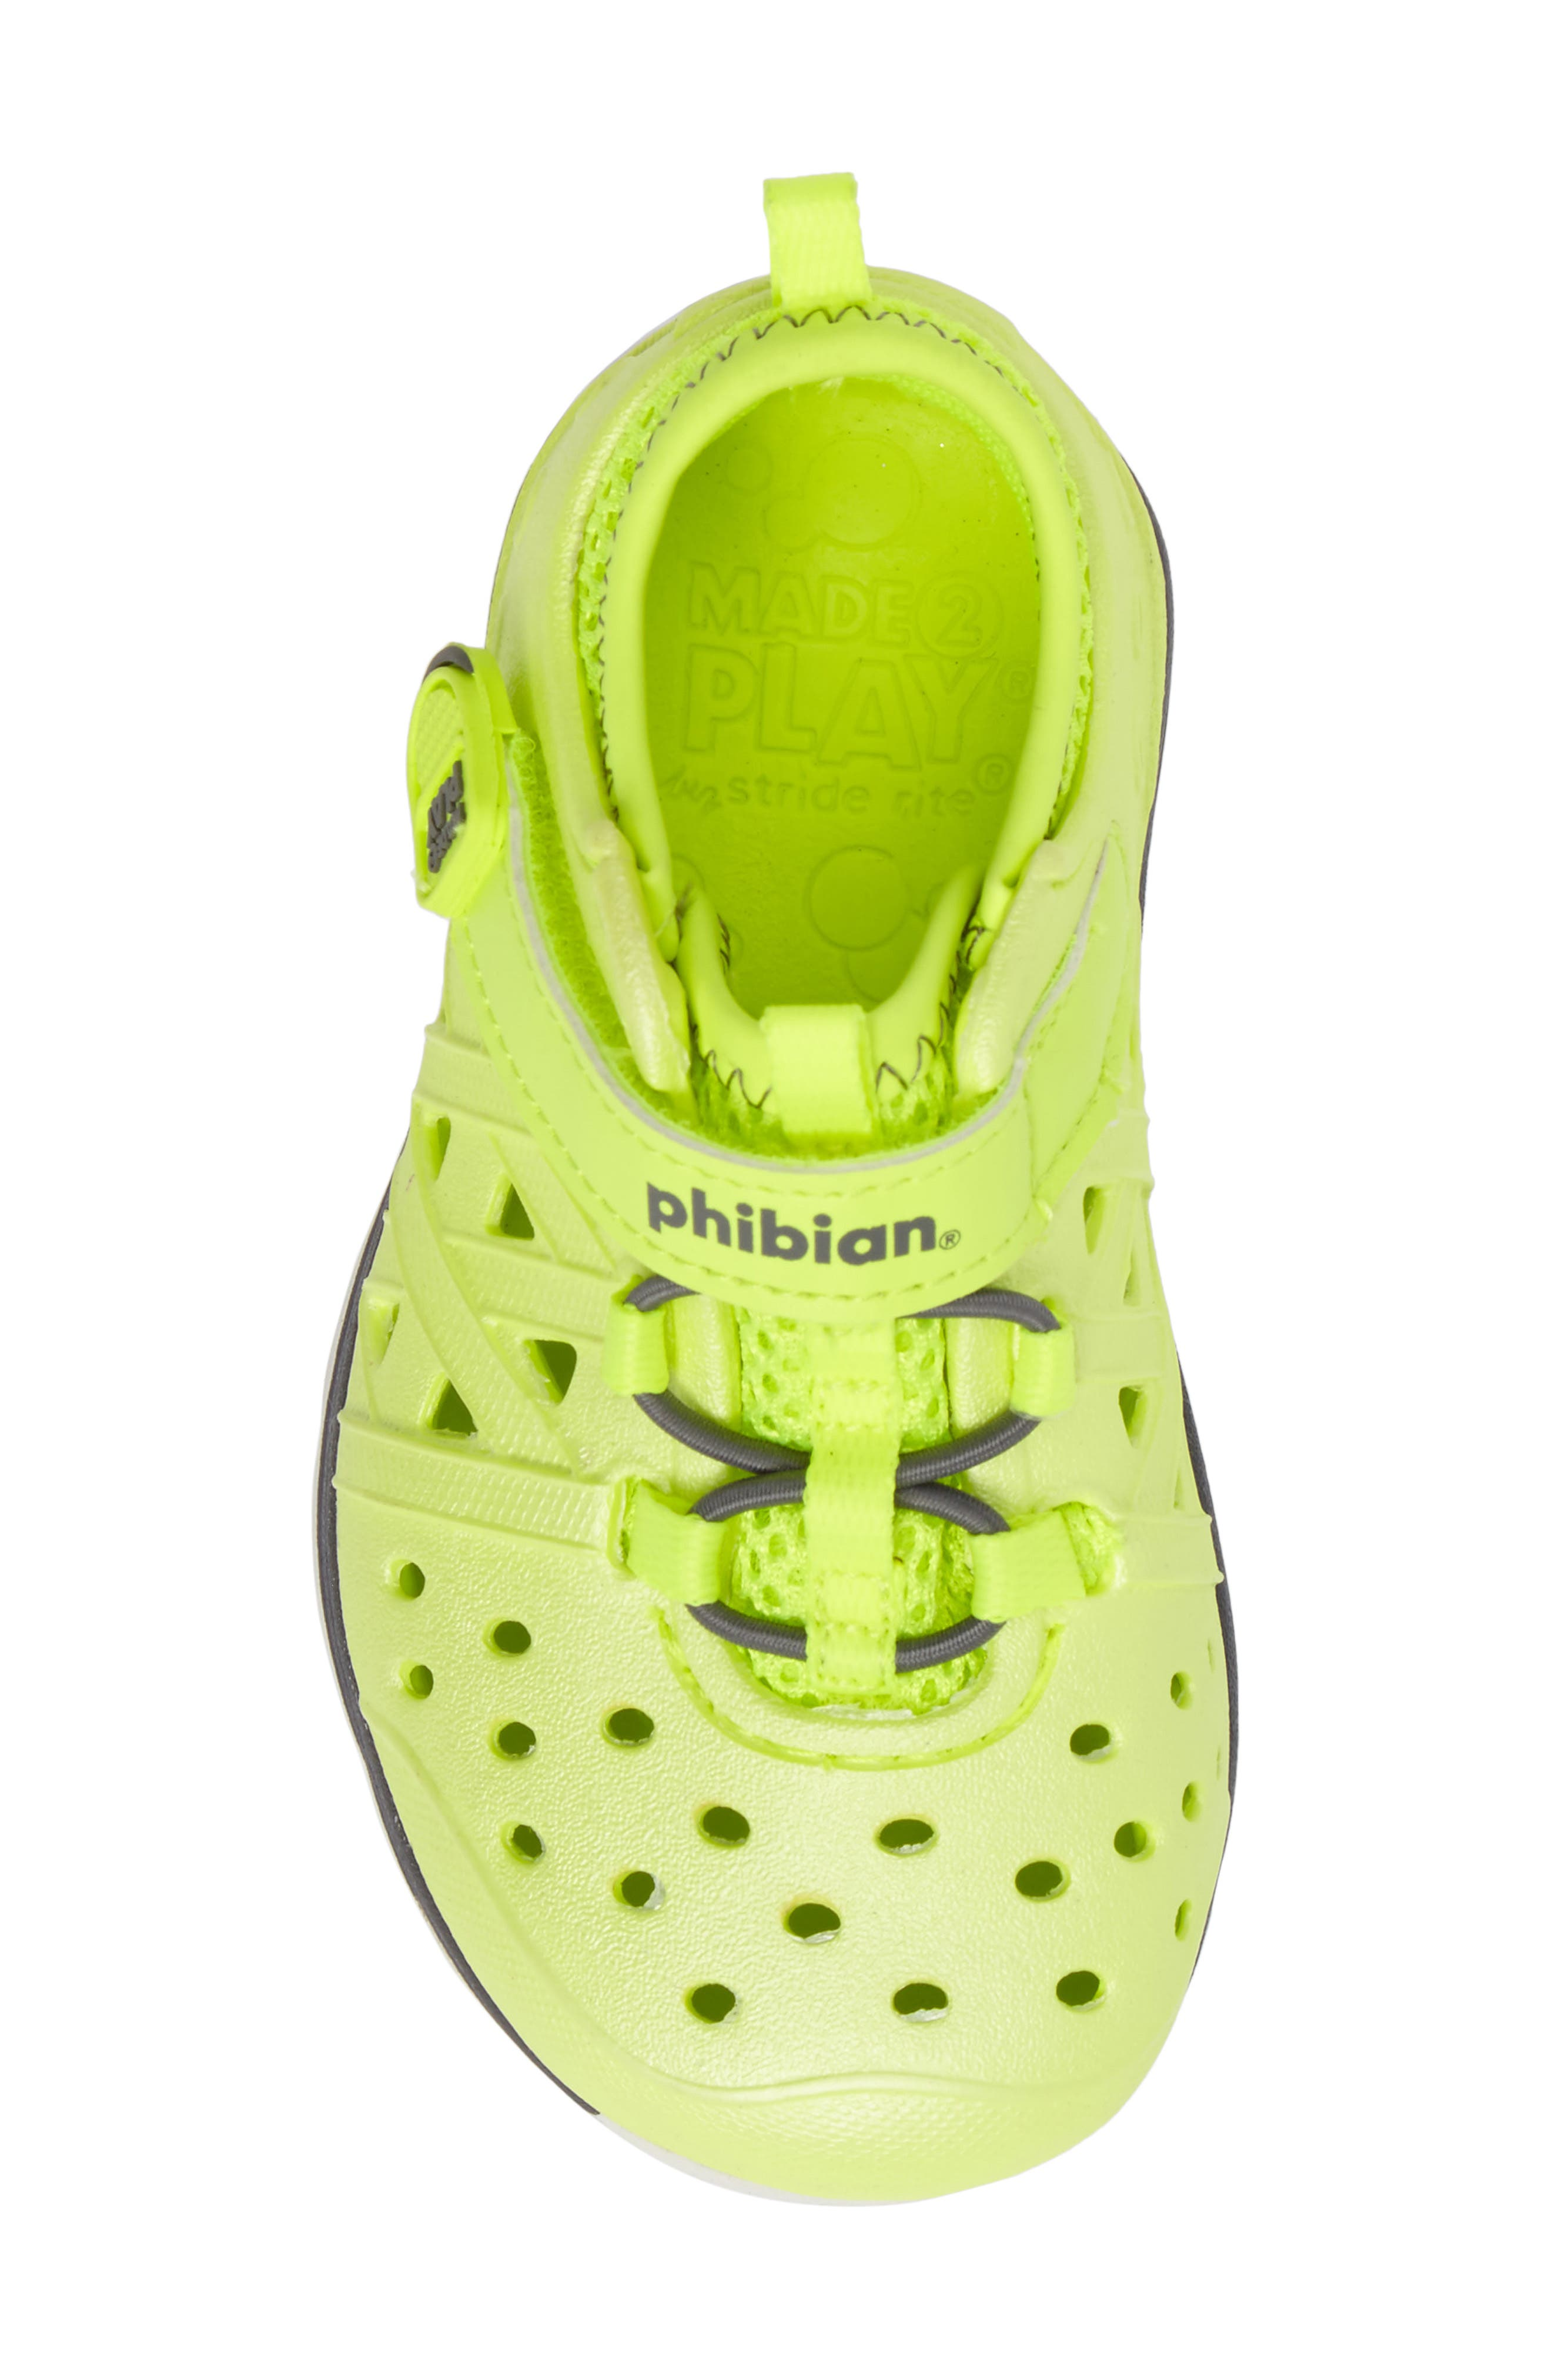 Made2Play<sup>®</sup> Phibian Sneaker,                             Alternate thumbnail 5, color,                             Citron Metallic